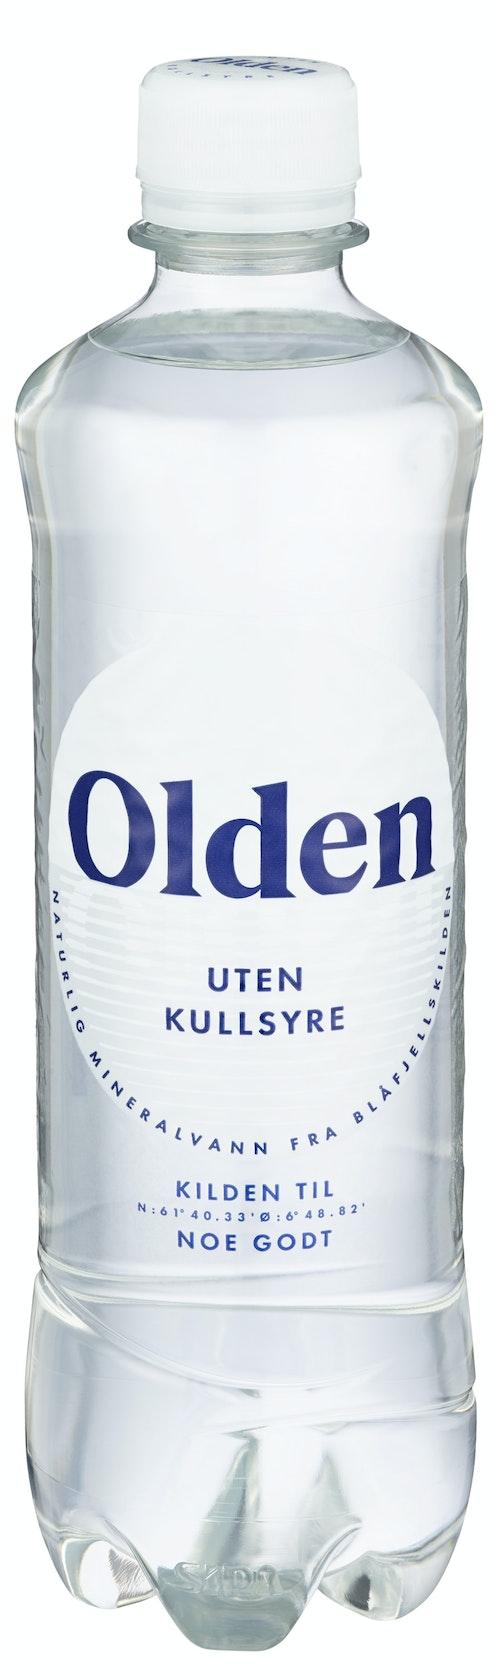 Olden Olden Stillvann 0,5 l